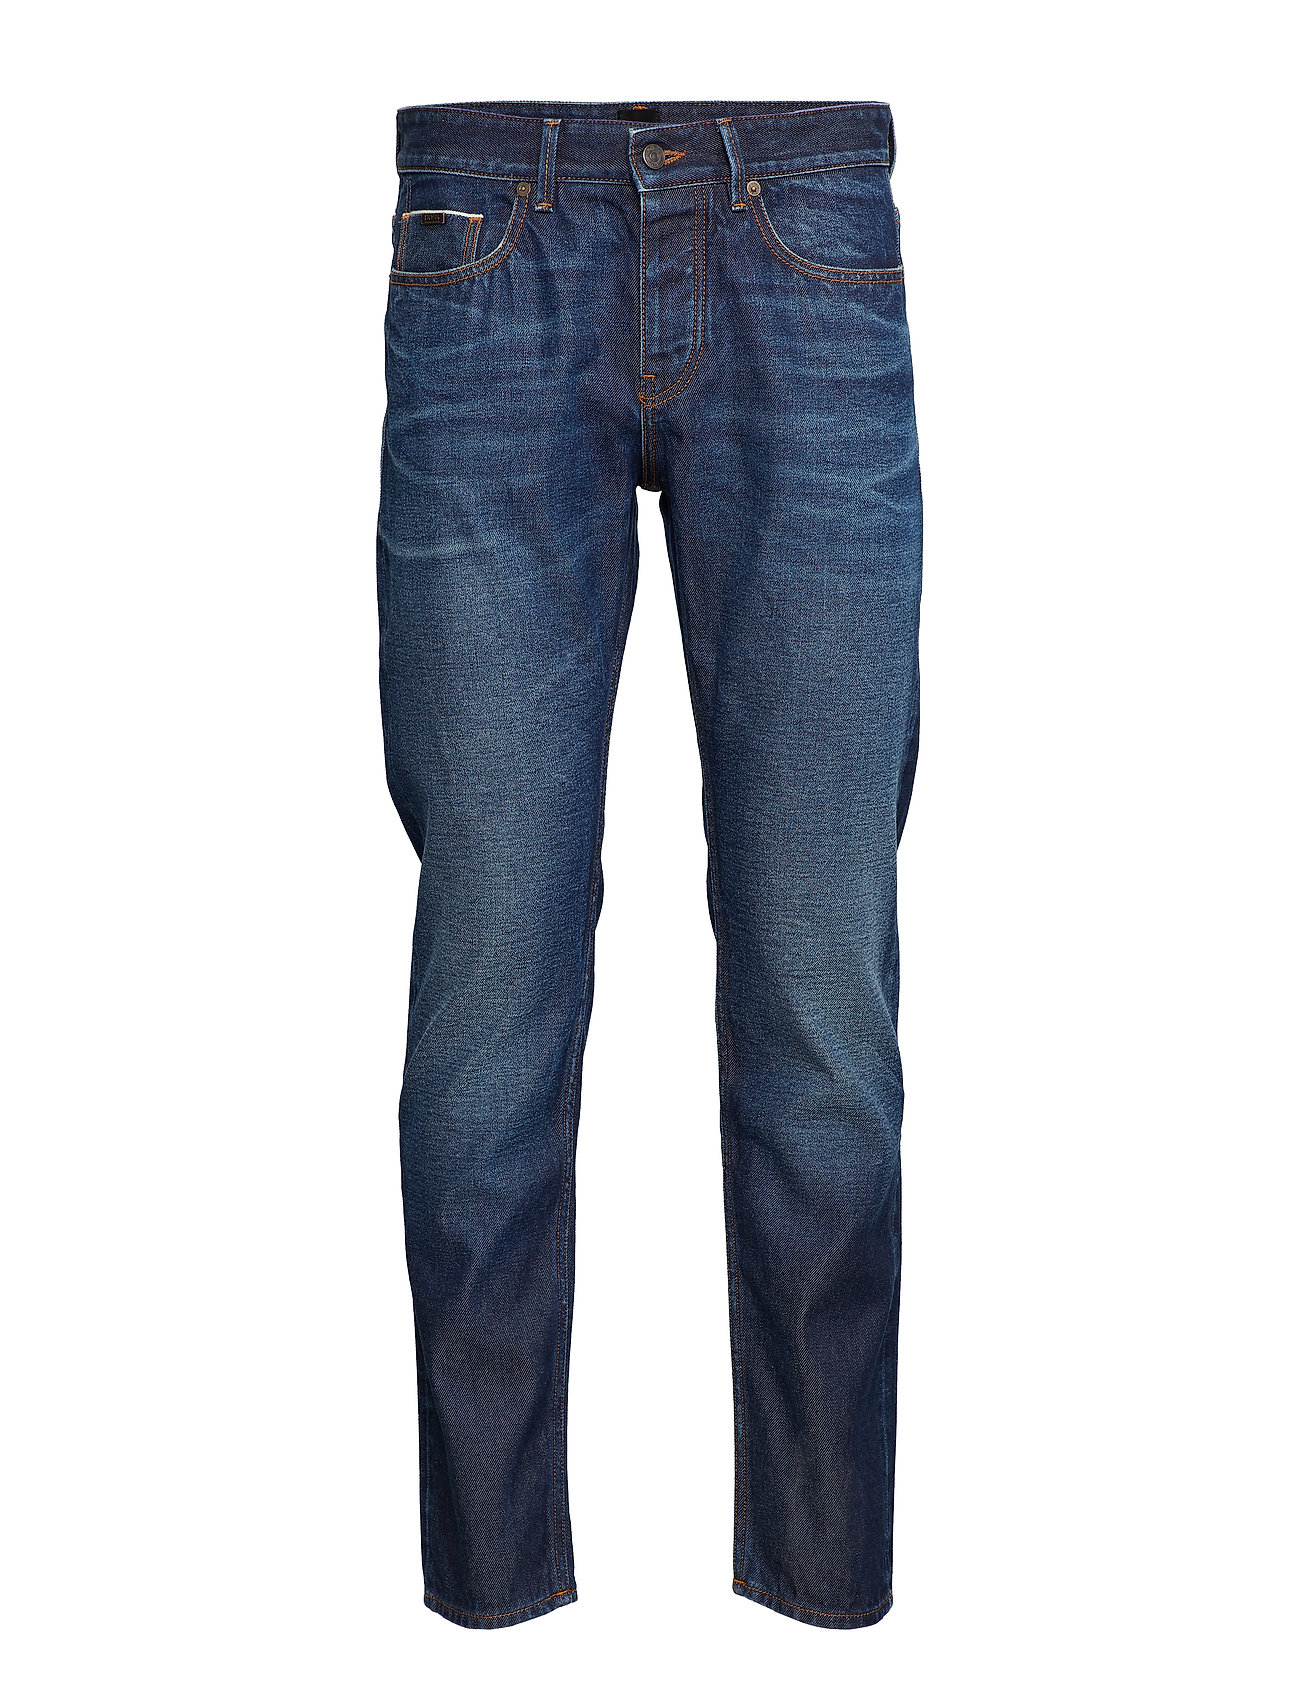 Boss Casual Wear Taber BC-S - DARK BLUE